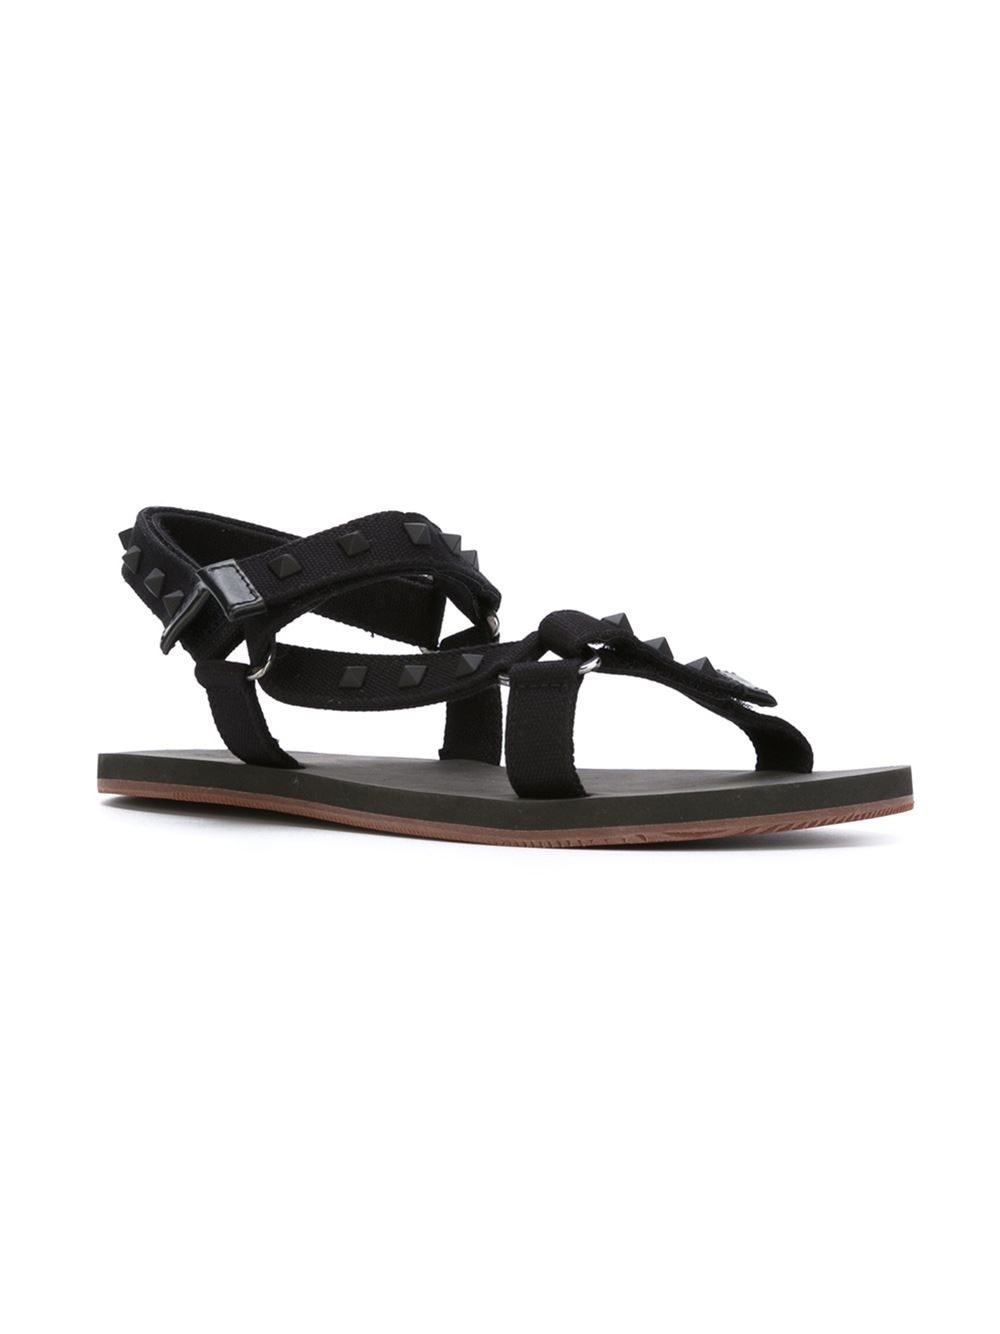 valentino rockstud sandals in black for lyst